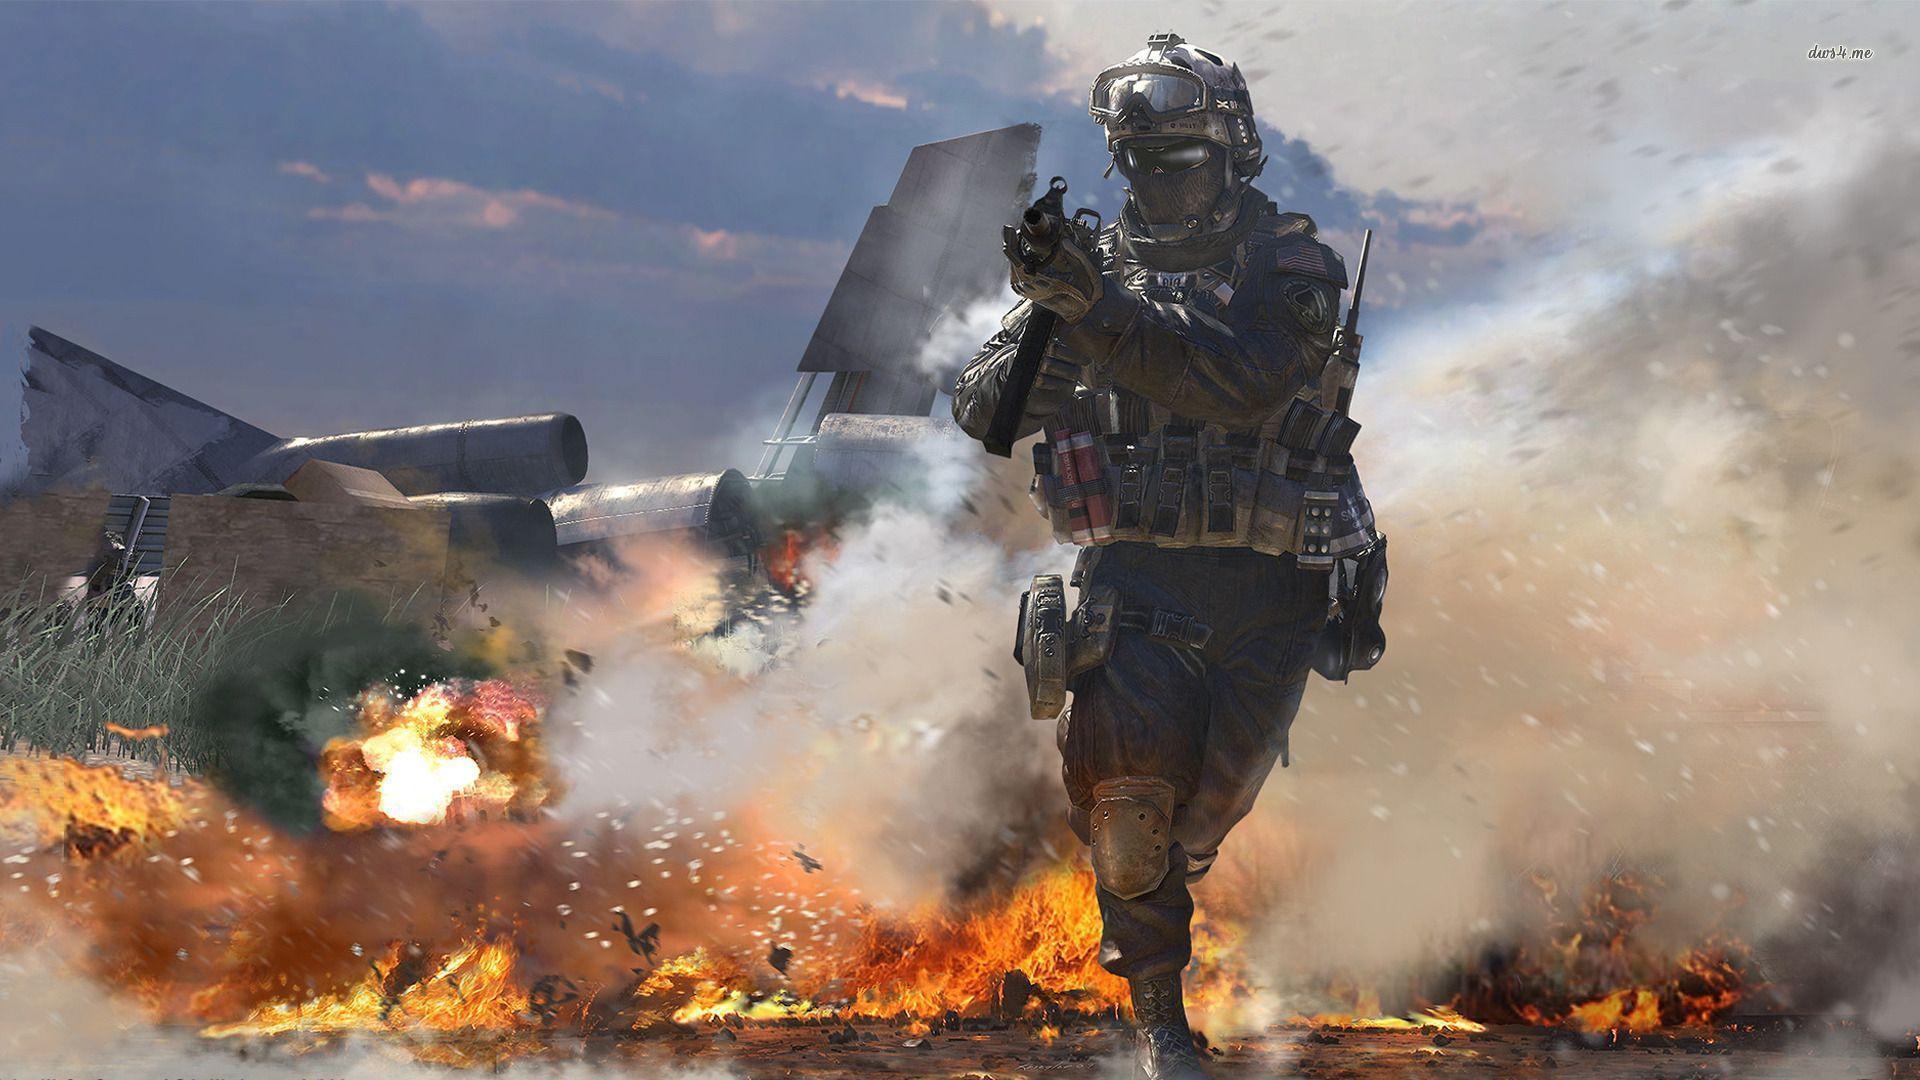 Modern Warfare 2 Wallpaper 1080p (75+ images)